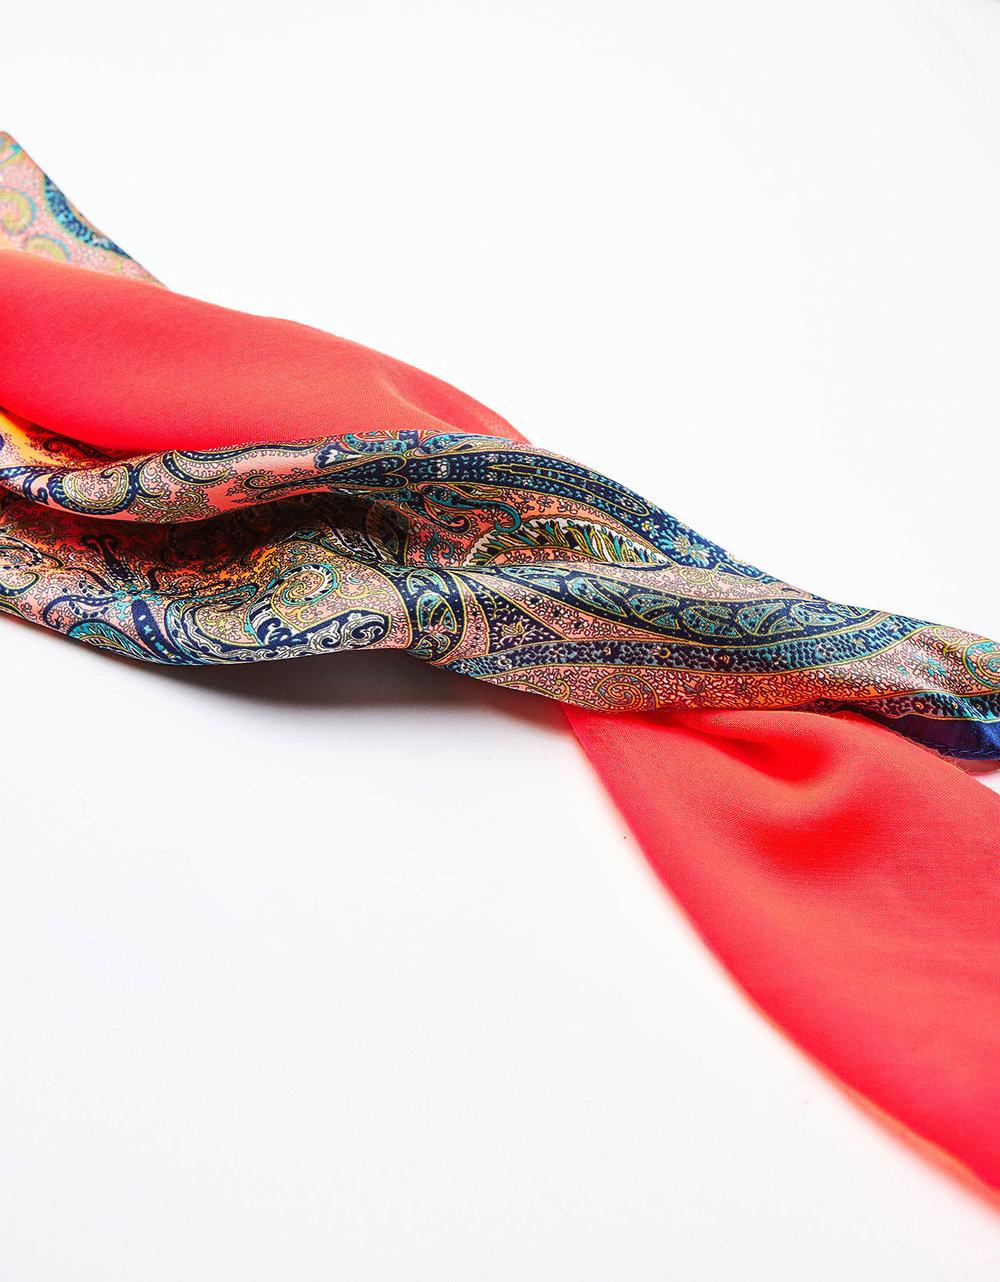 Conjunto de lenços gargantilha, 7,99€, Bershka